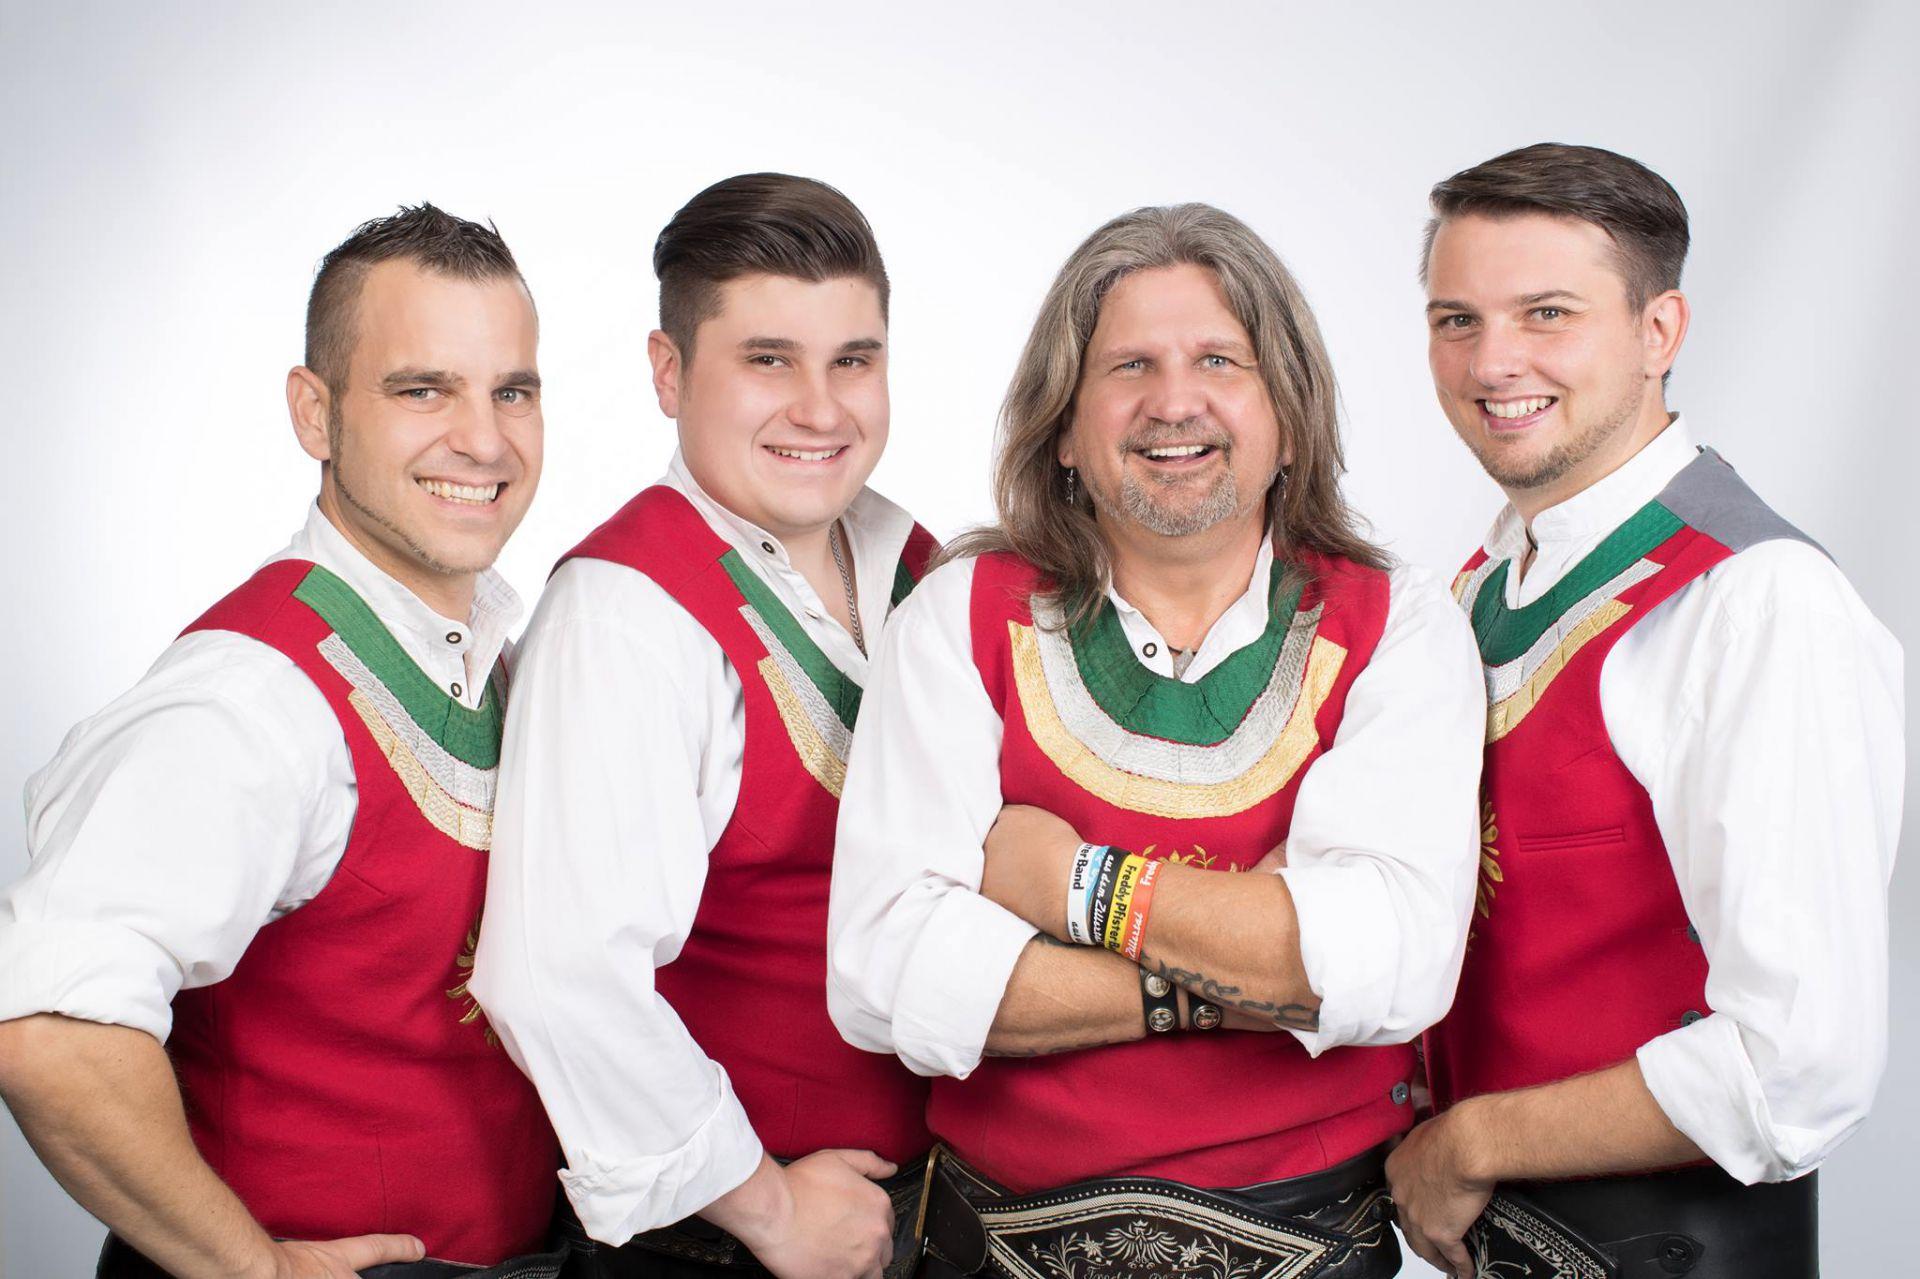 Eerste editie Maibaumfeest met Freddy Pfister Band